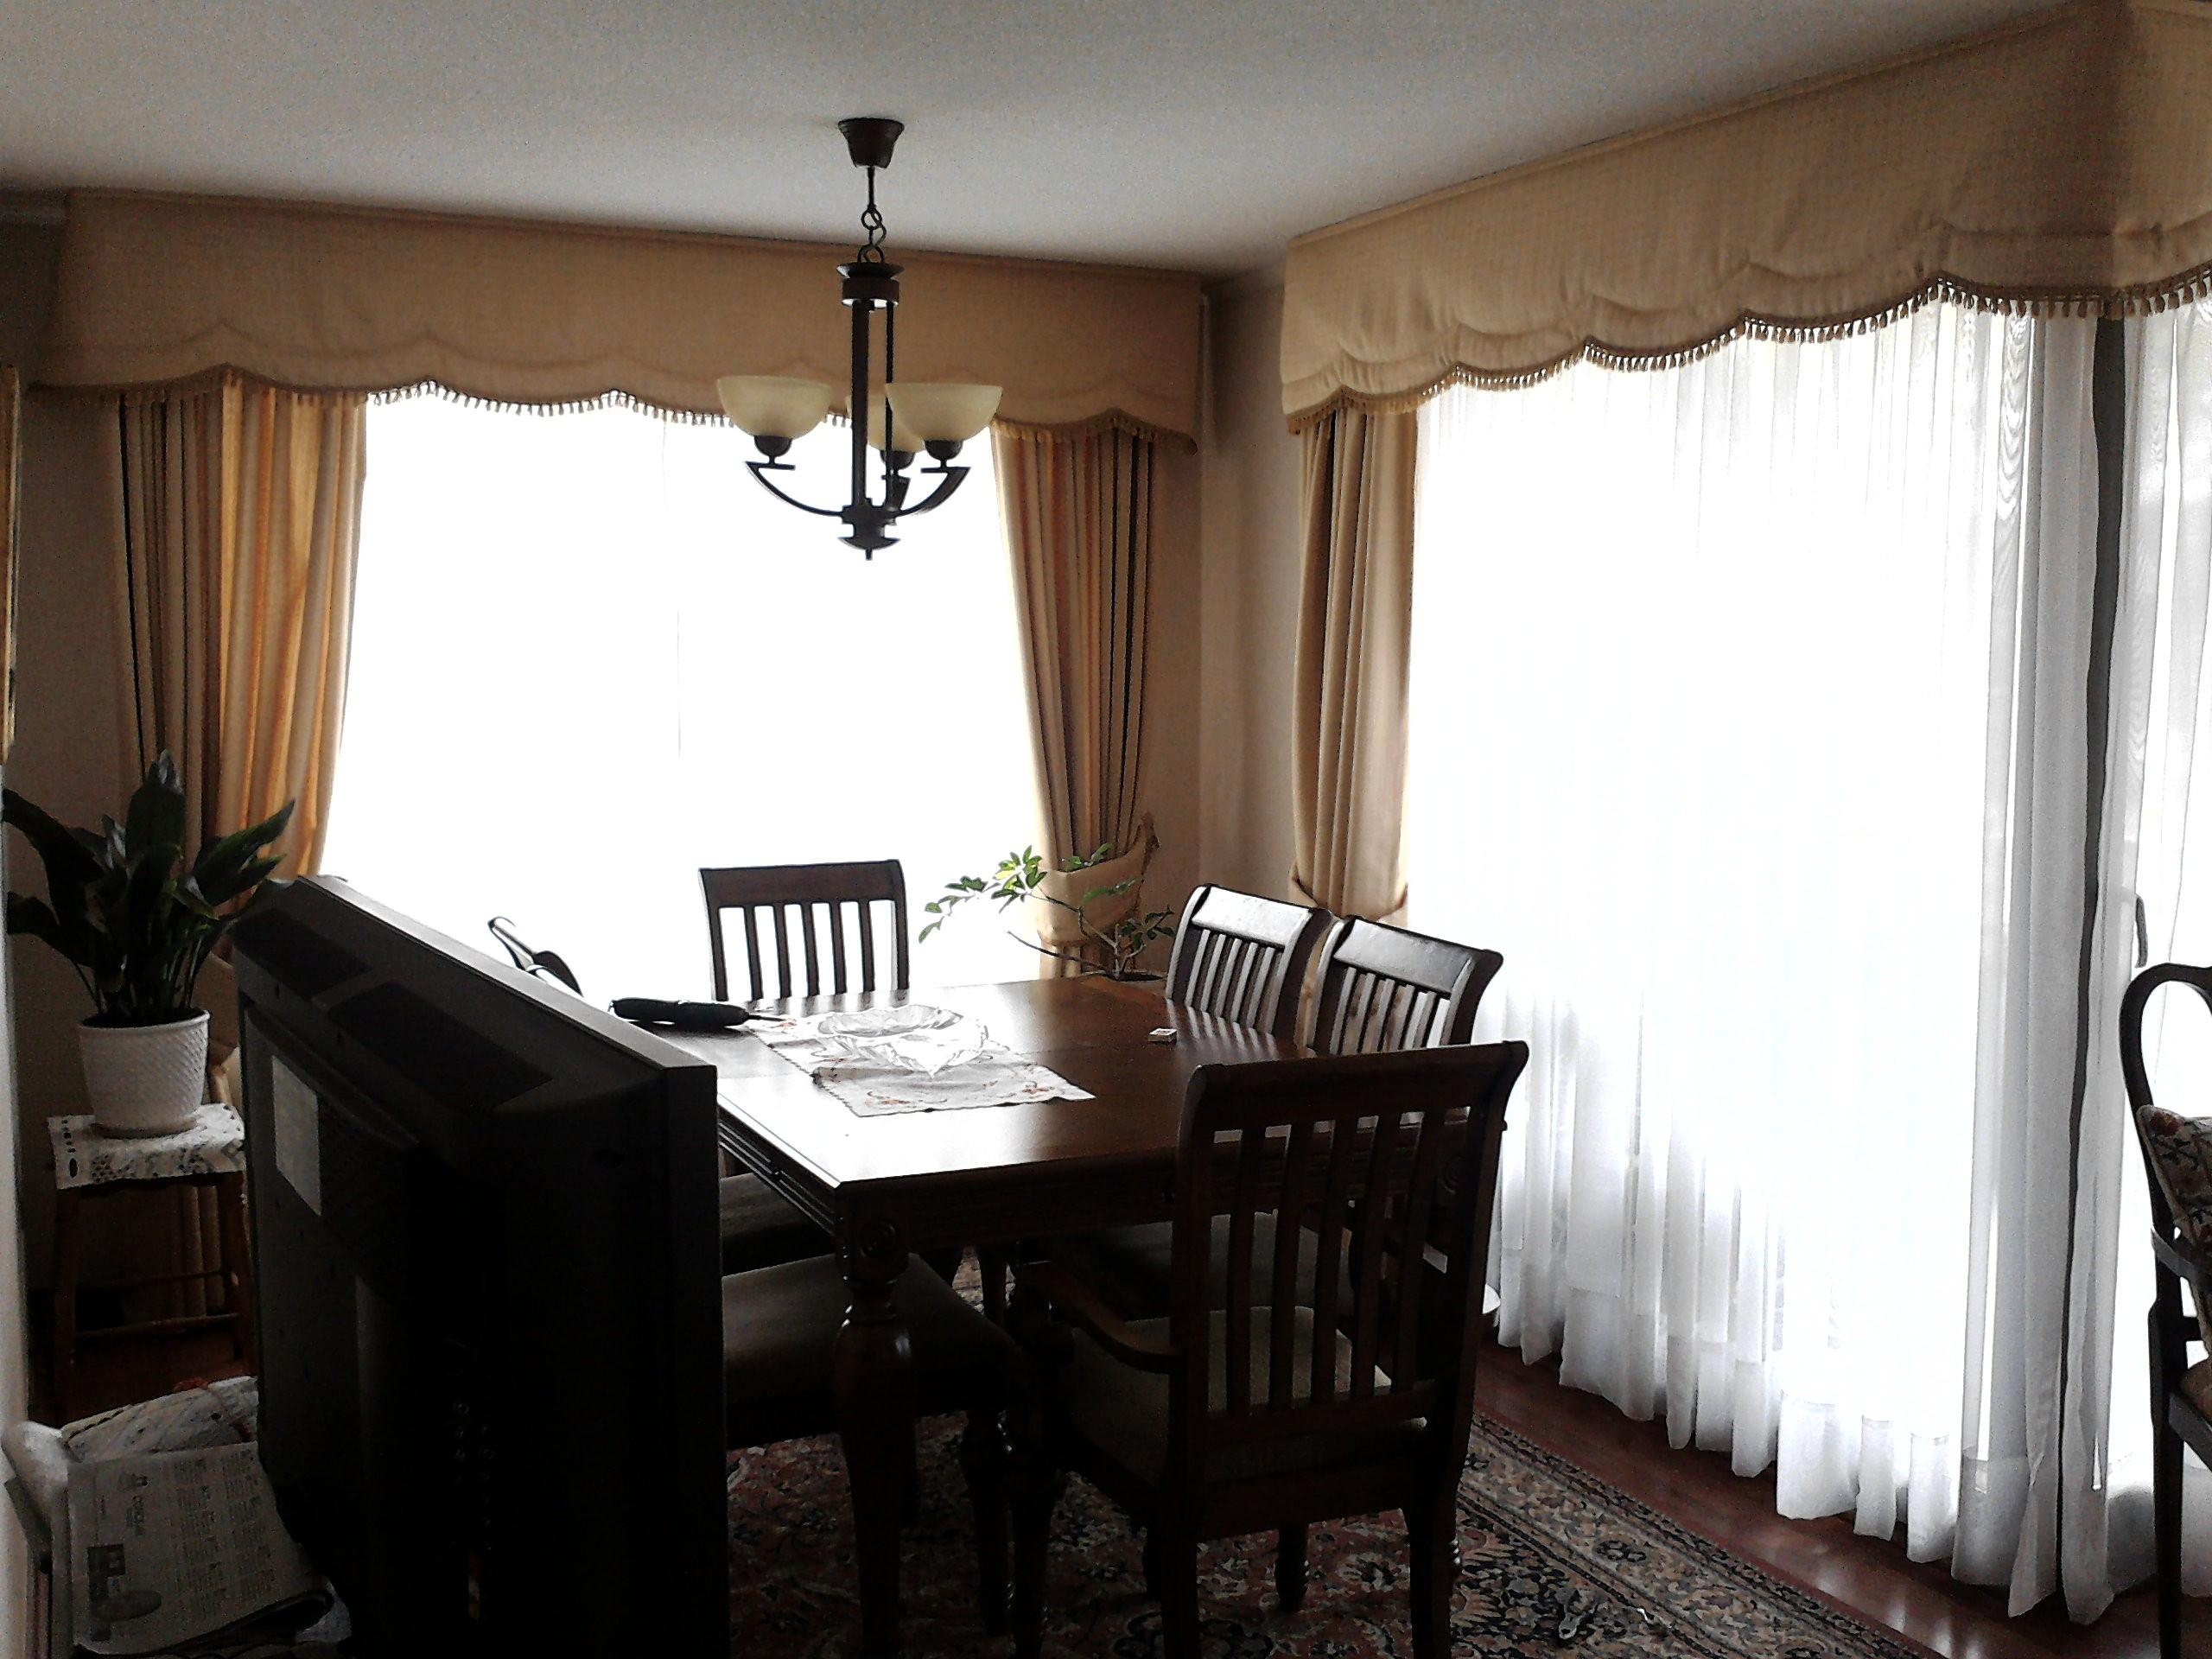 cortinas cenefas cortinas con pinzas venden cortinas cortinas en temuco